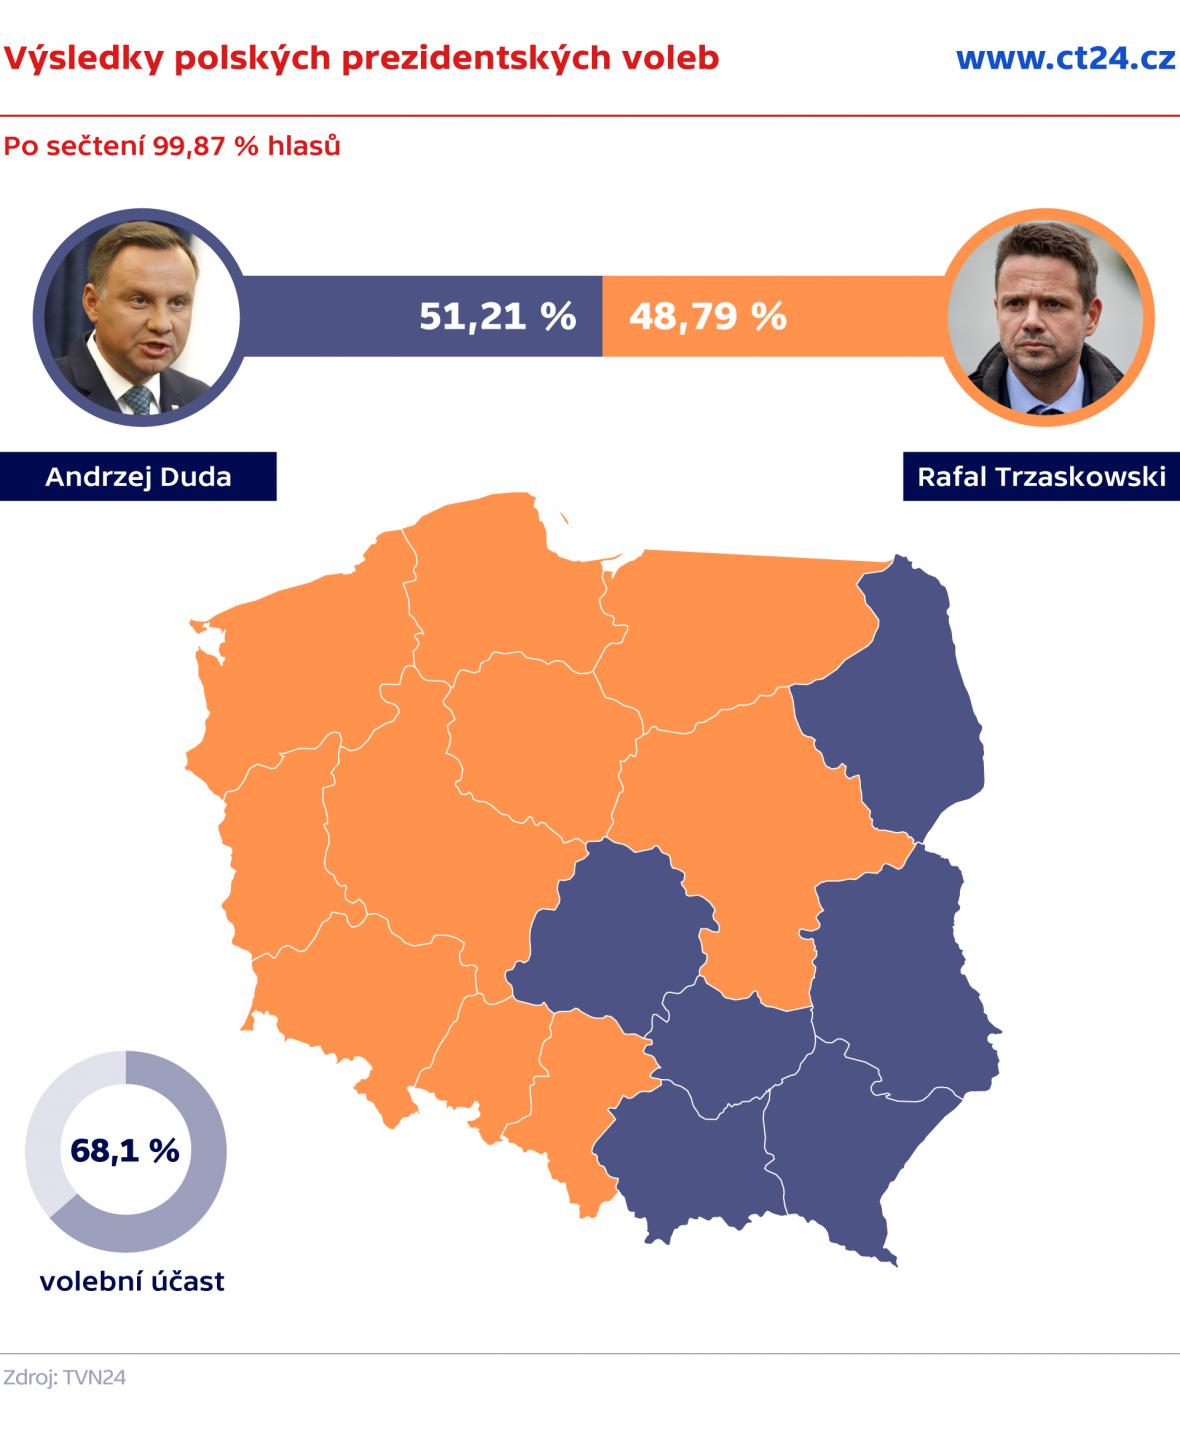 Výsledky Polských prezidentských voleb